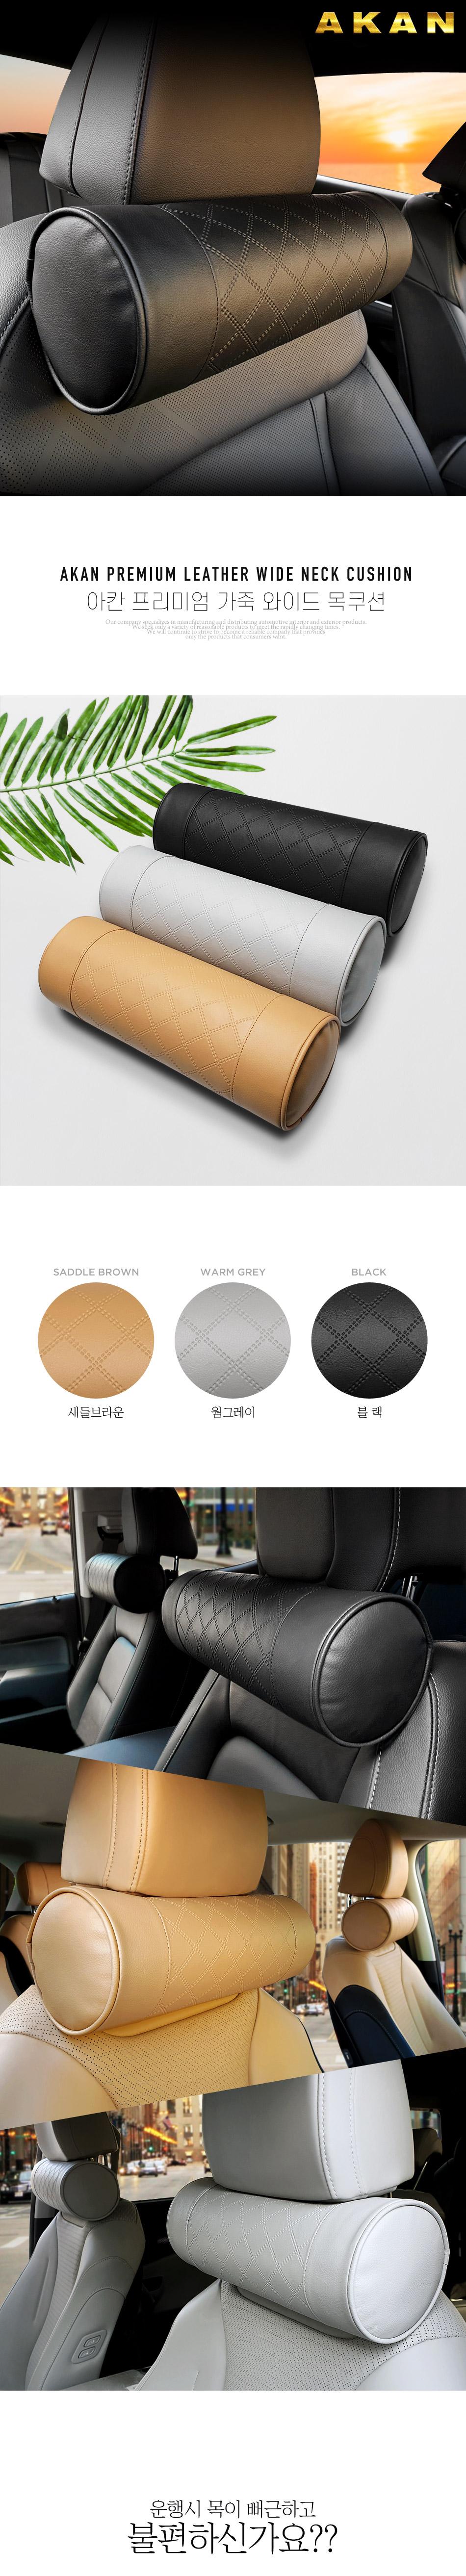 akan-leather-wide-neck-cushion_01.jpg